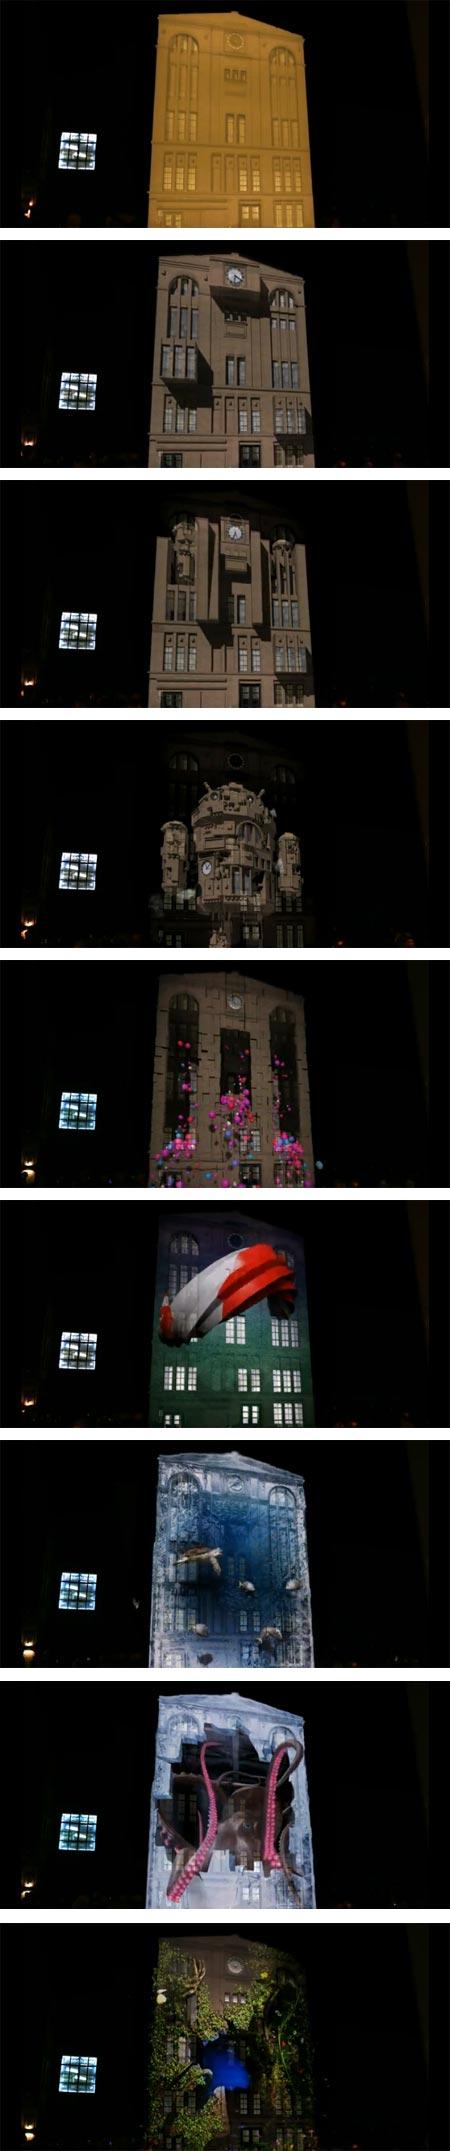 LG Optimus facade mapping  in Berlin